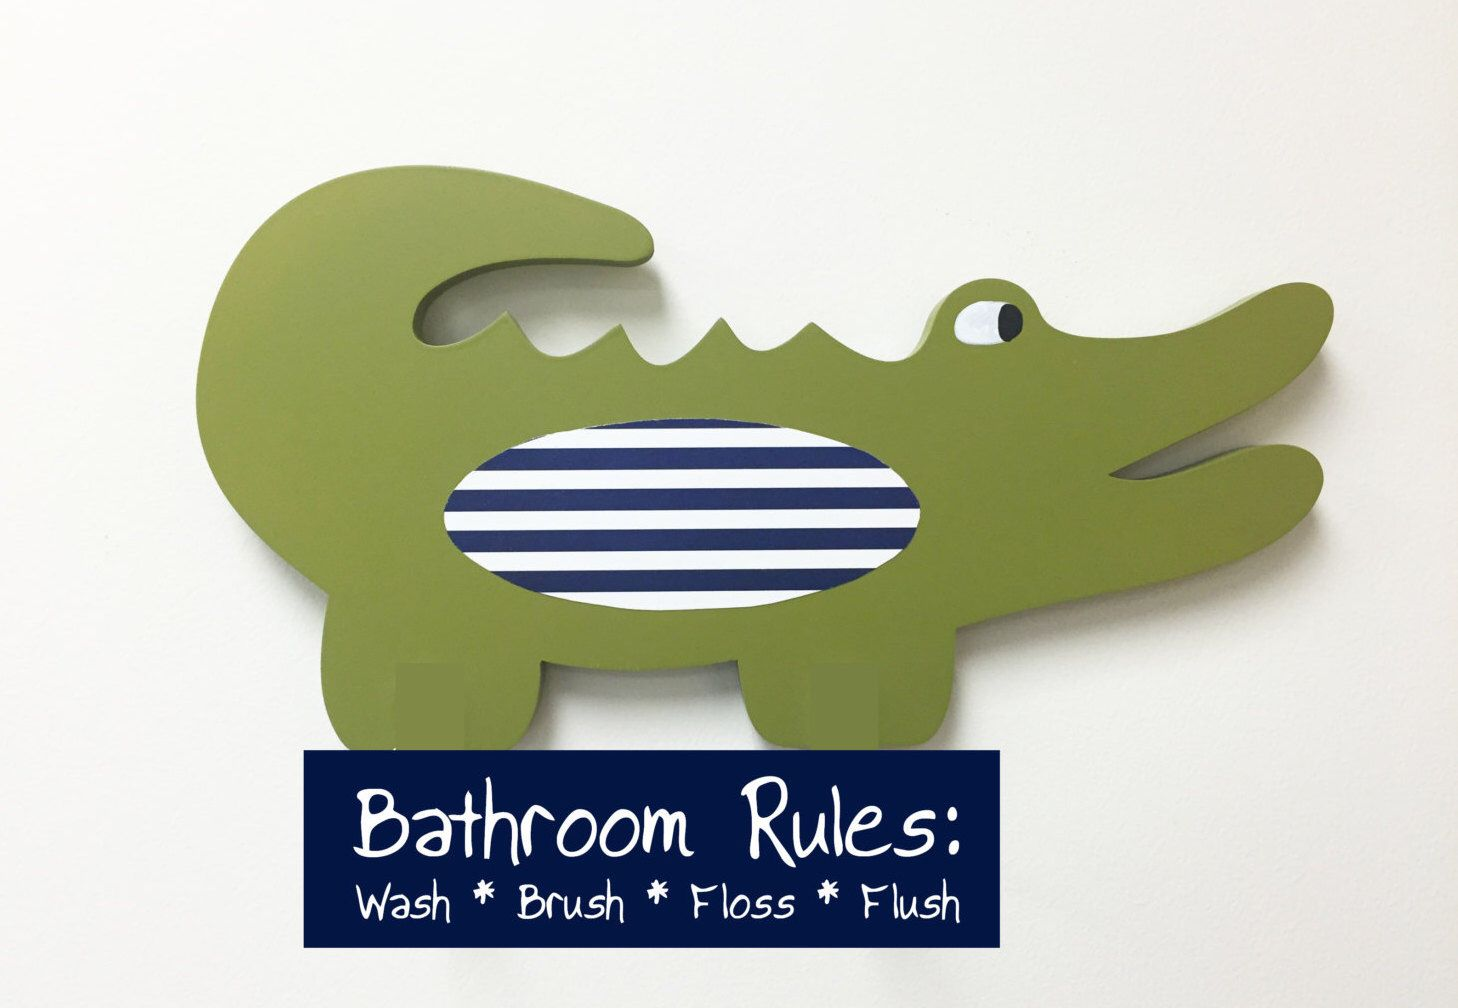 Alligator Bathroom, Alligator Nursery, Bathroom Rules Sign, Kidu0027s Bathroom  Decor, Wooden Alligator